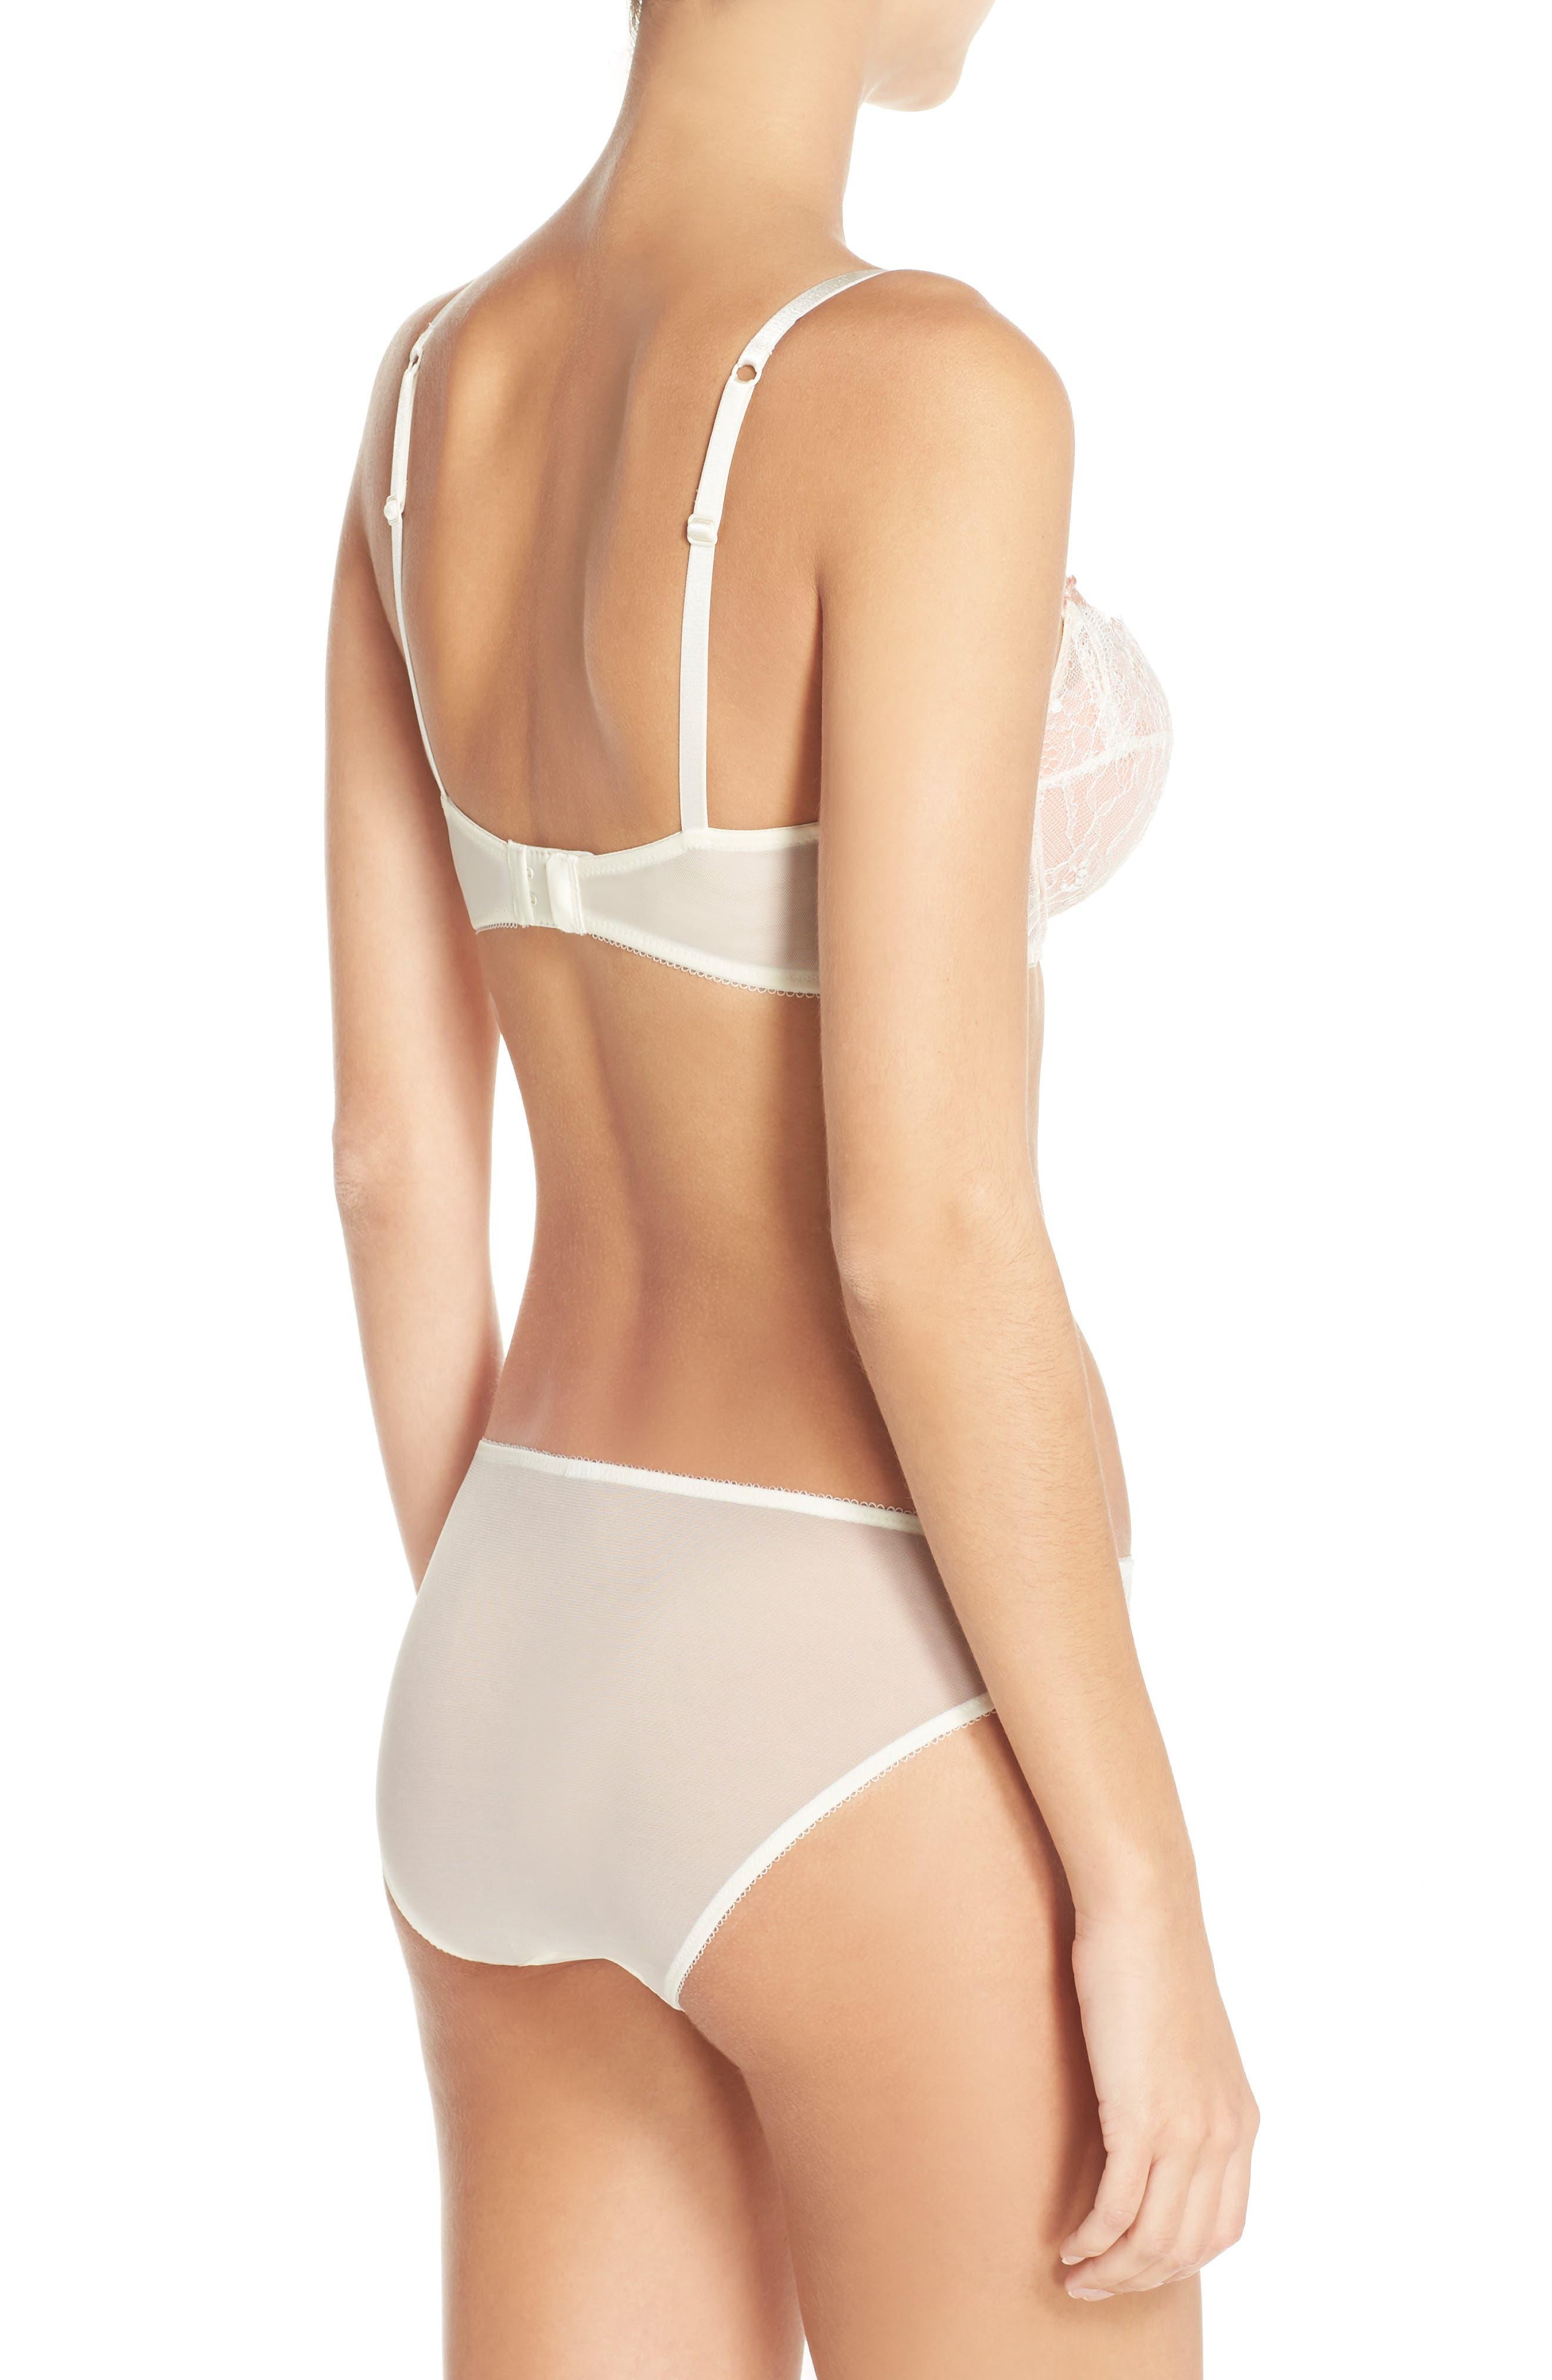 'B Sultry' Bikini,                             Alternate thumbnail 2, color,                             VANILLA ICE/ PEACH BEIGE